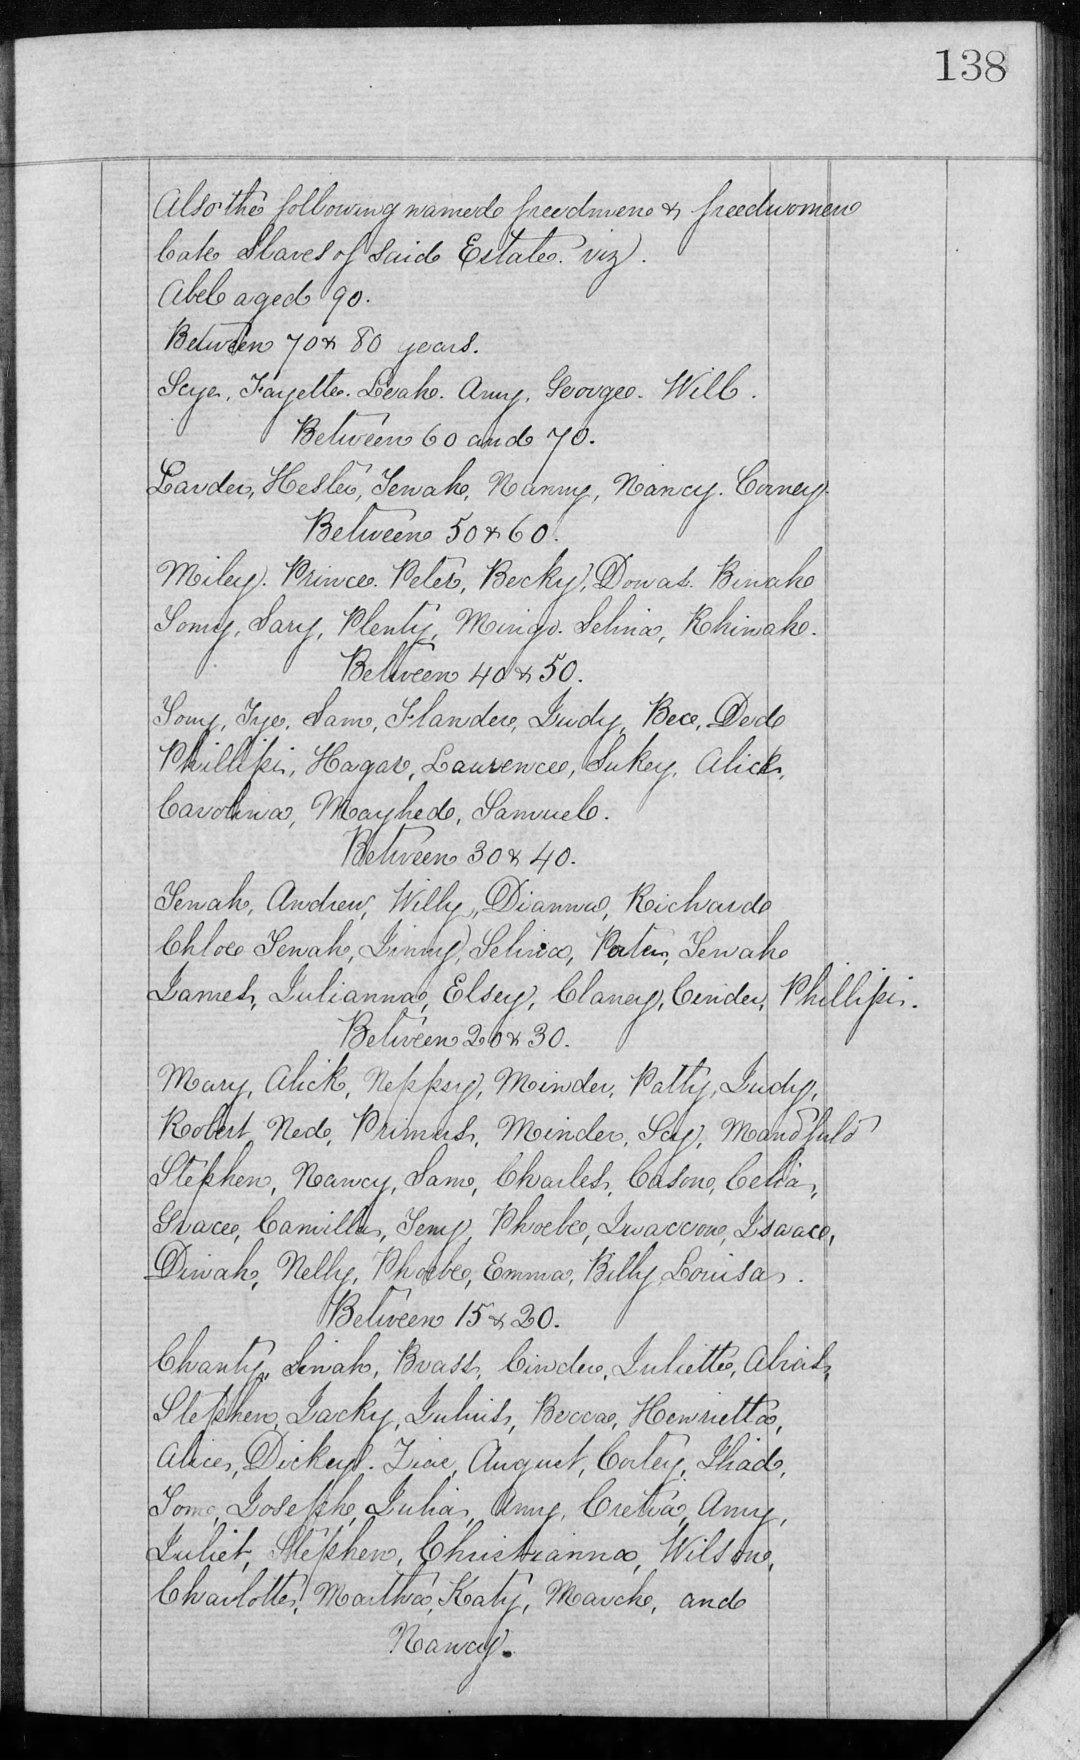 Porcher John P Est Inv Book G (1864-67) p138